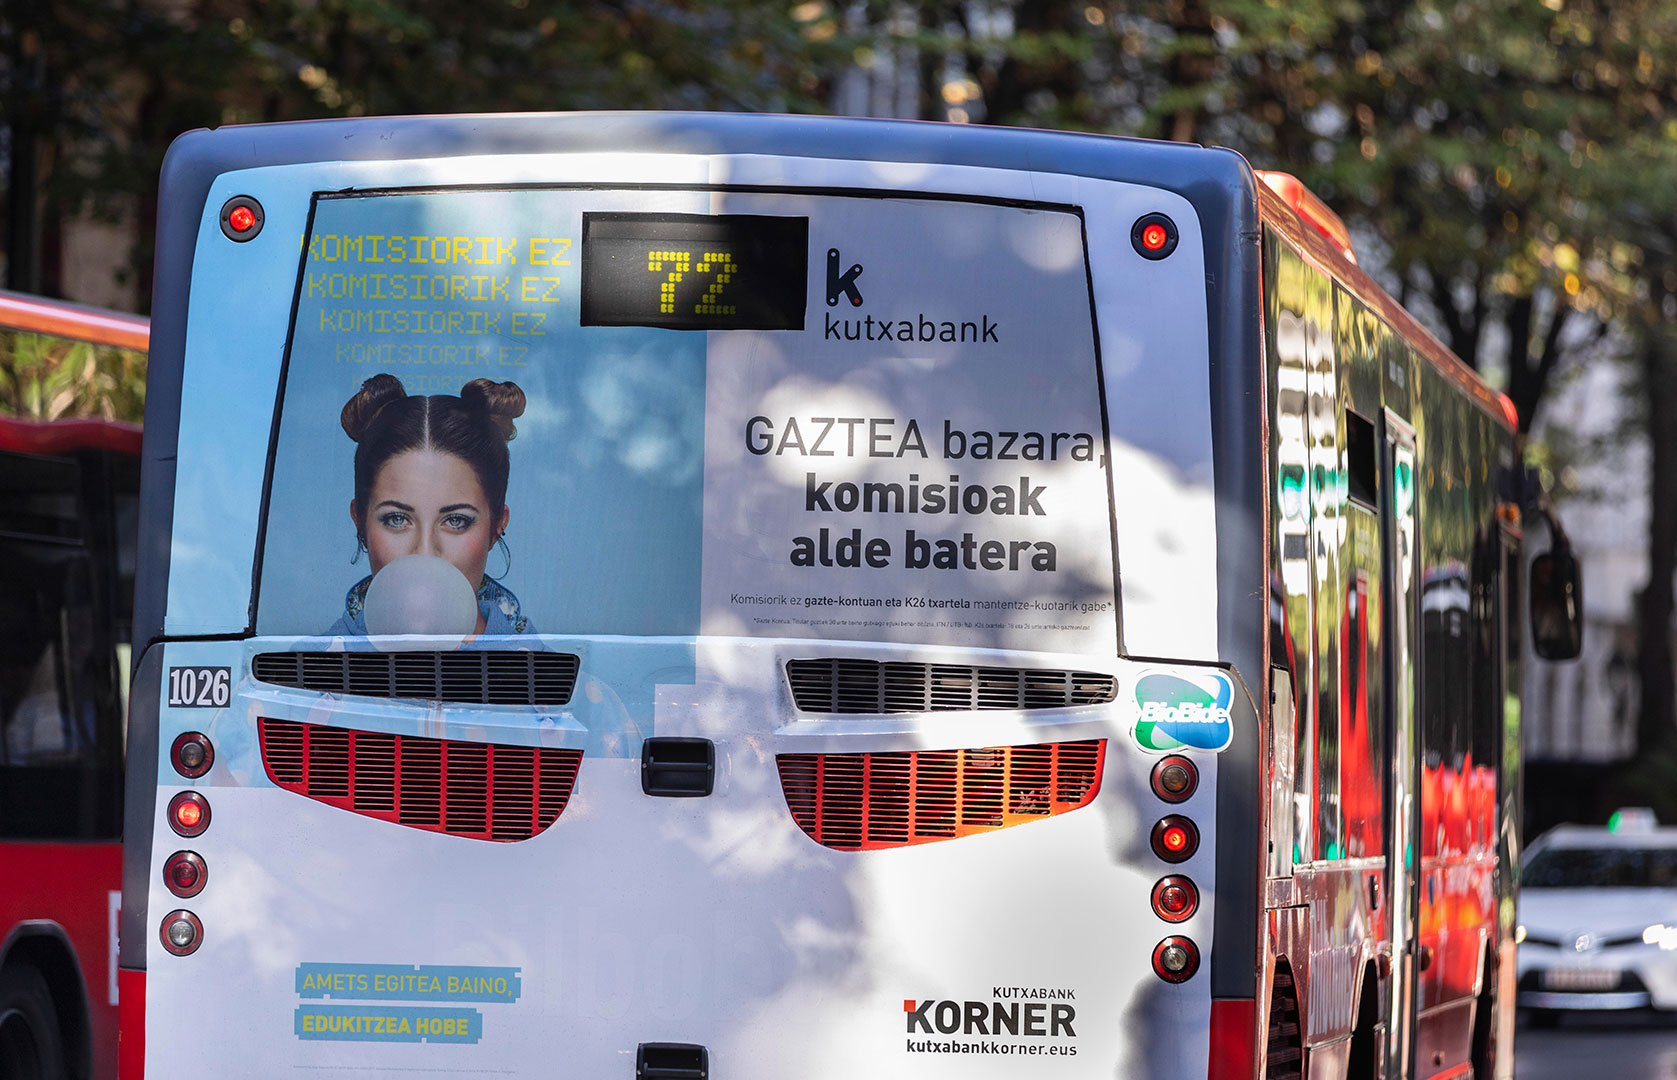 kutxabank korner Bilbobus trasera